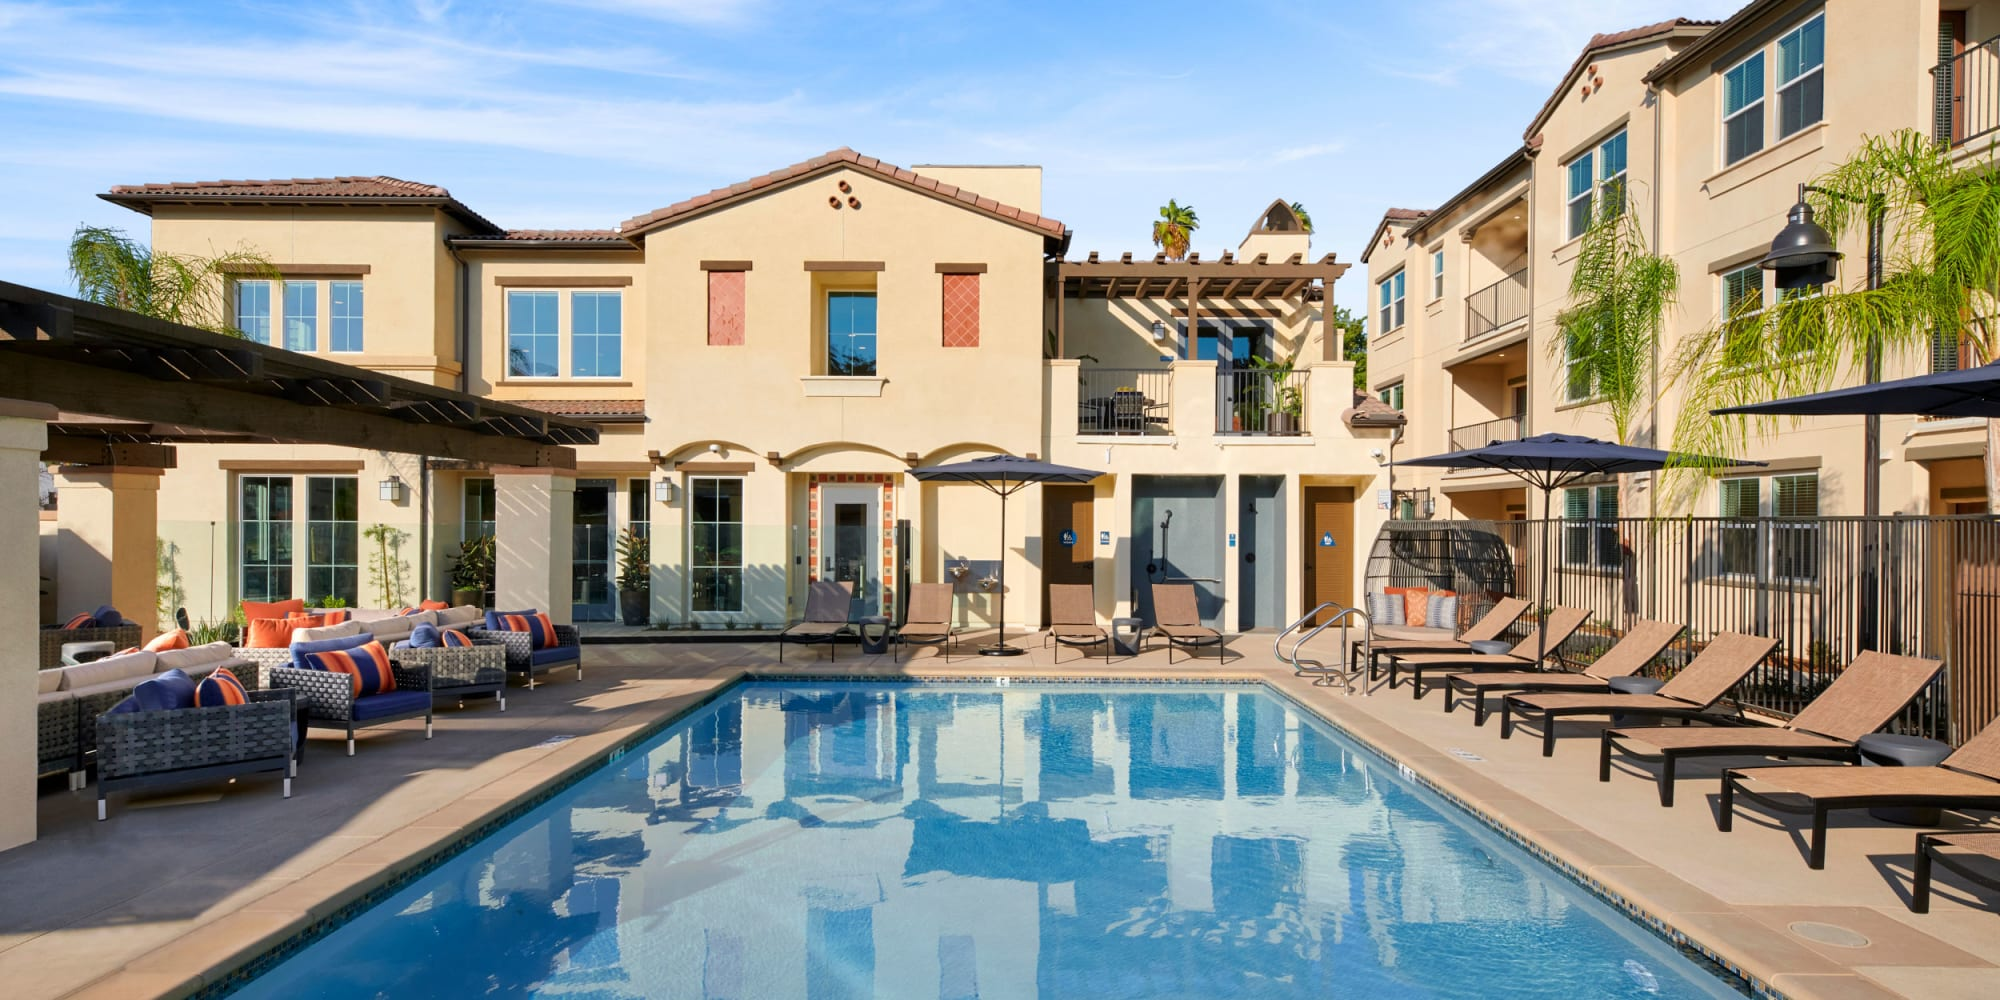 The REMM Group Announces Leasing of Van Daele Development's Lincoln Village Apartment Community in Riverside, California